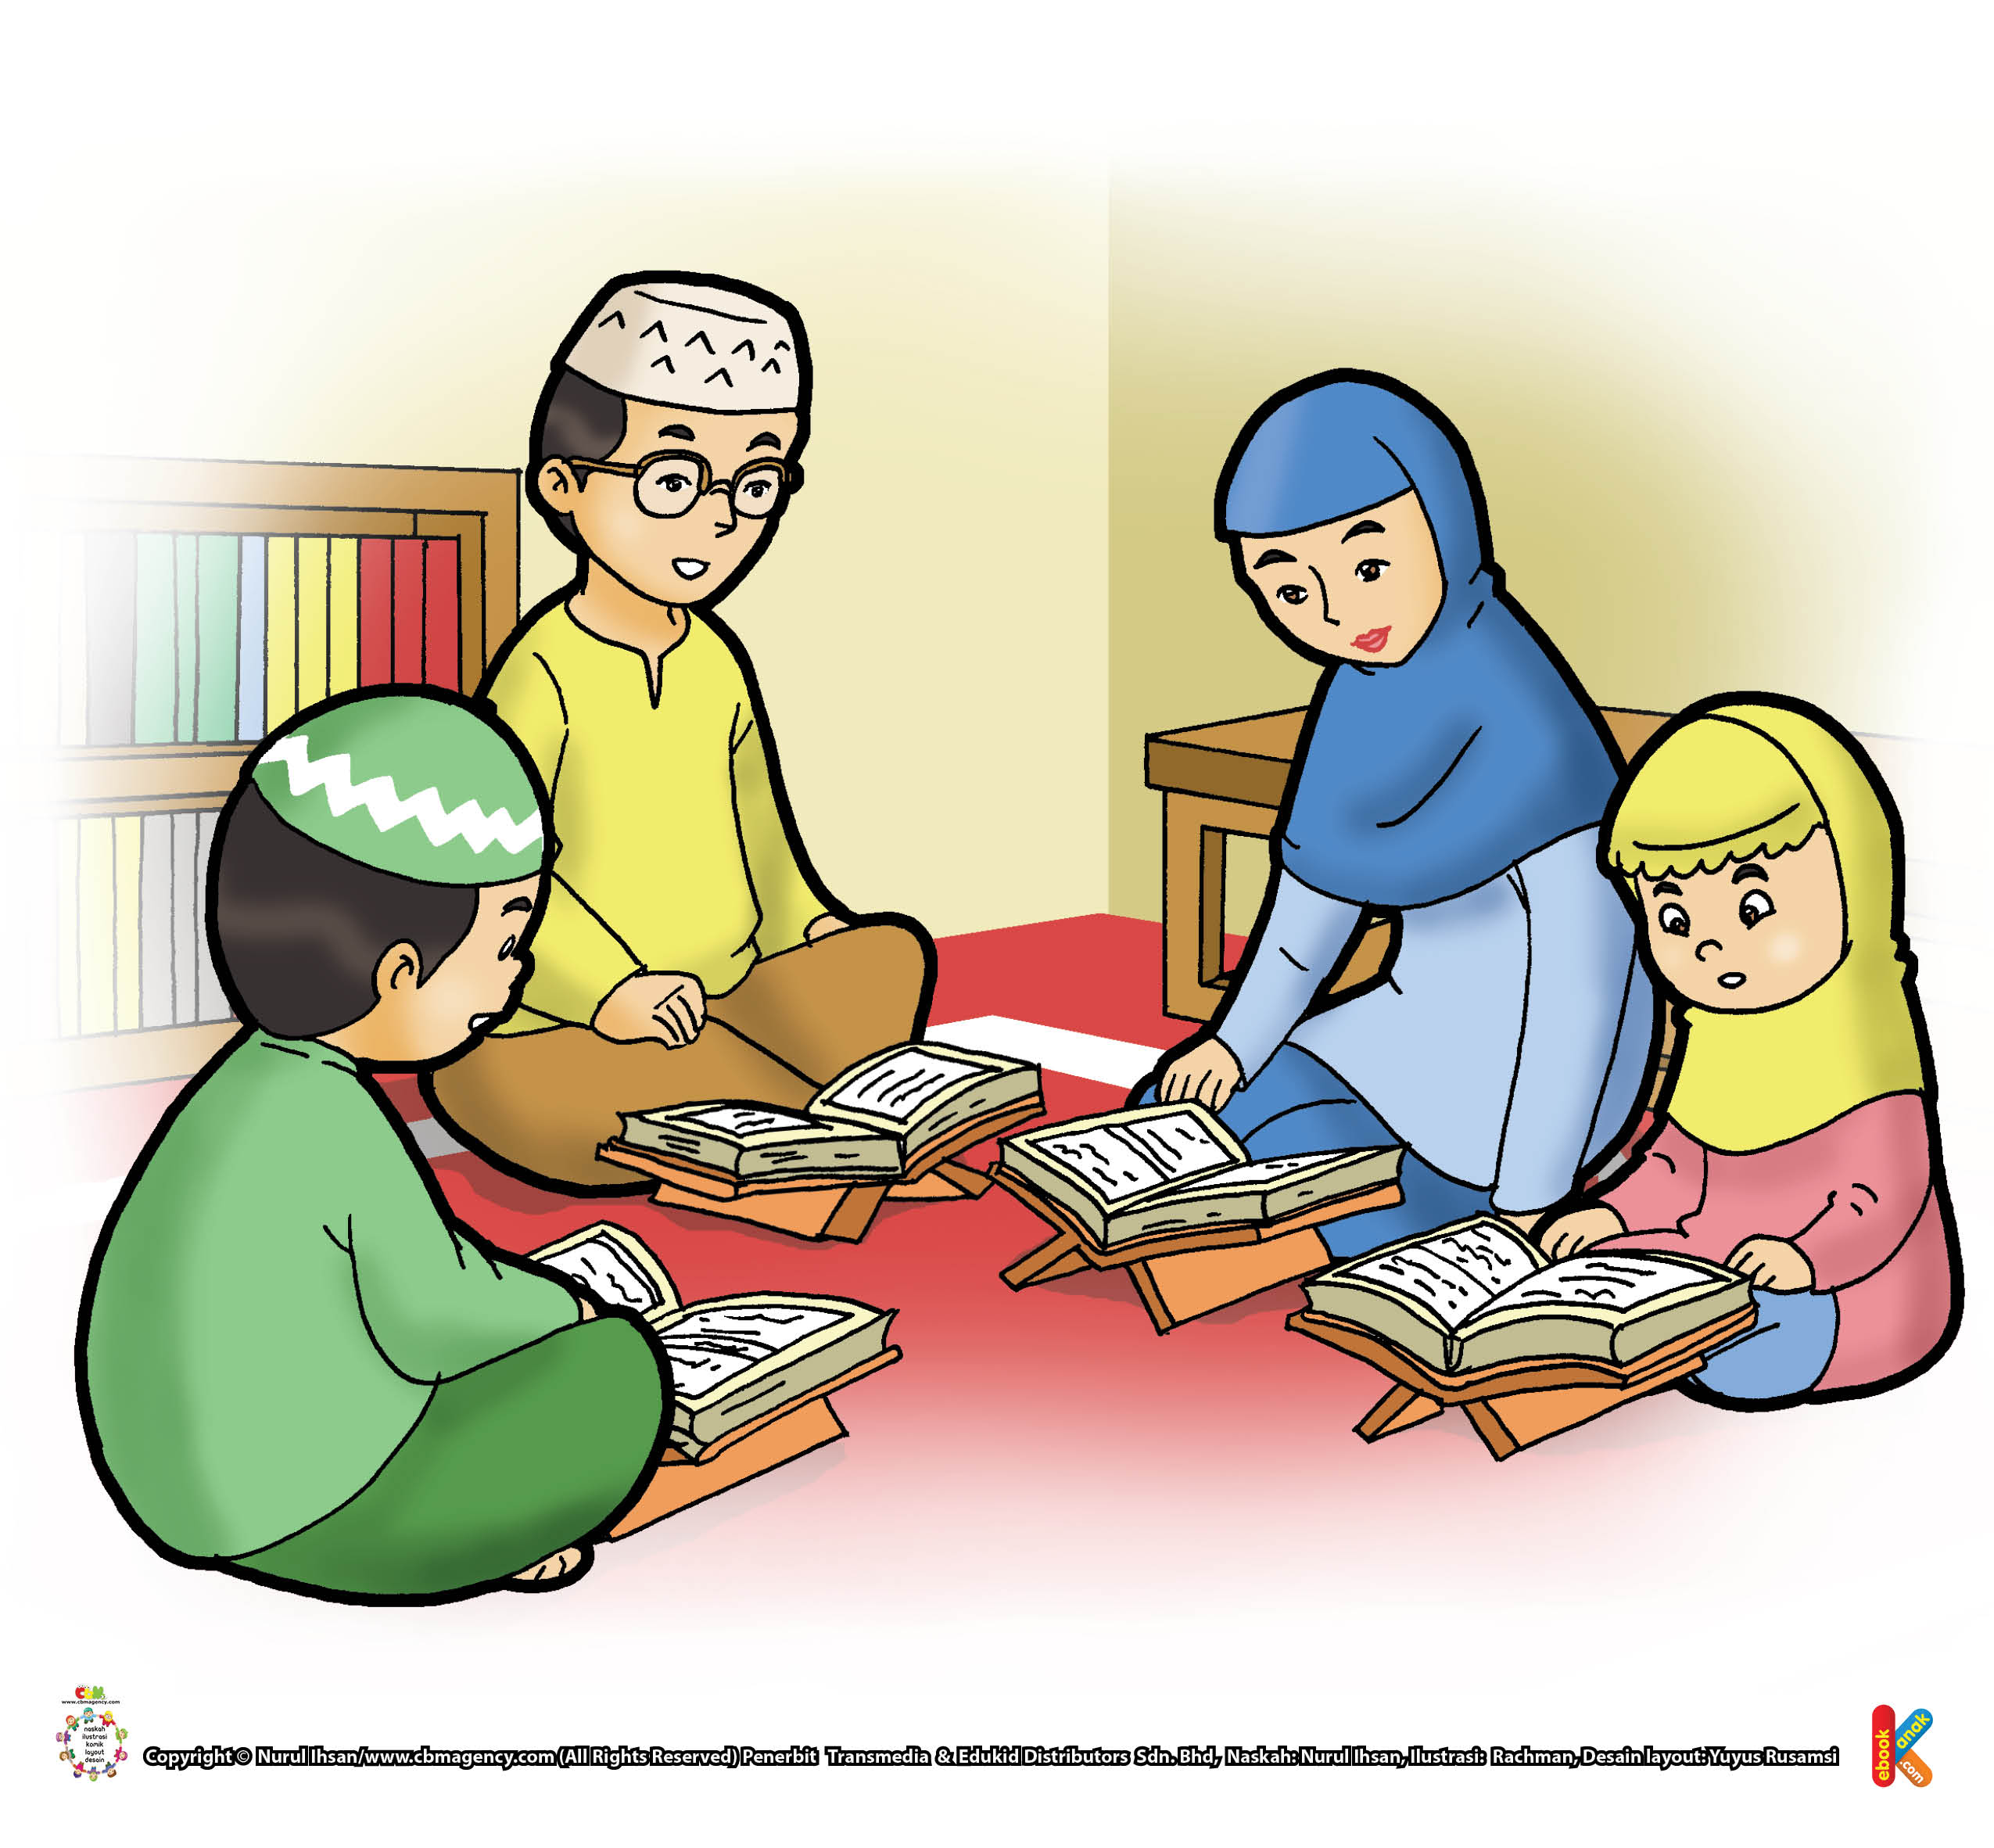 Tapi barangsiapa yang tidak beriman kepada Al-Qur'an, maka Allah akan menghinakannya dan merendahkan derajatnya.